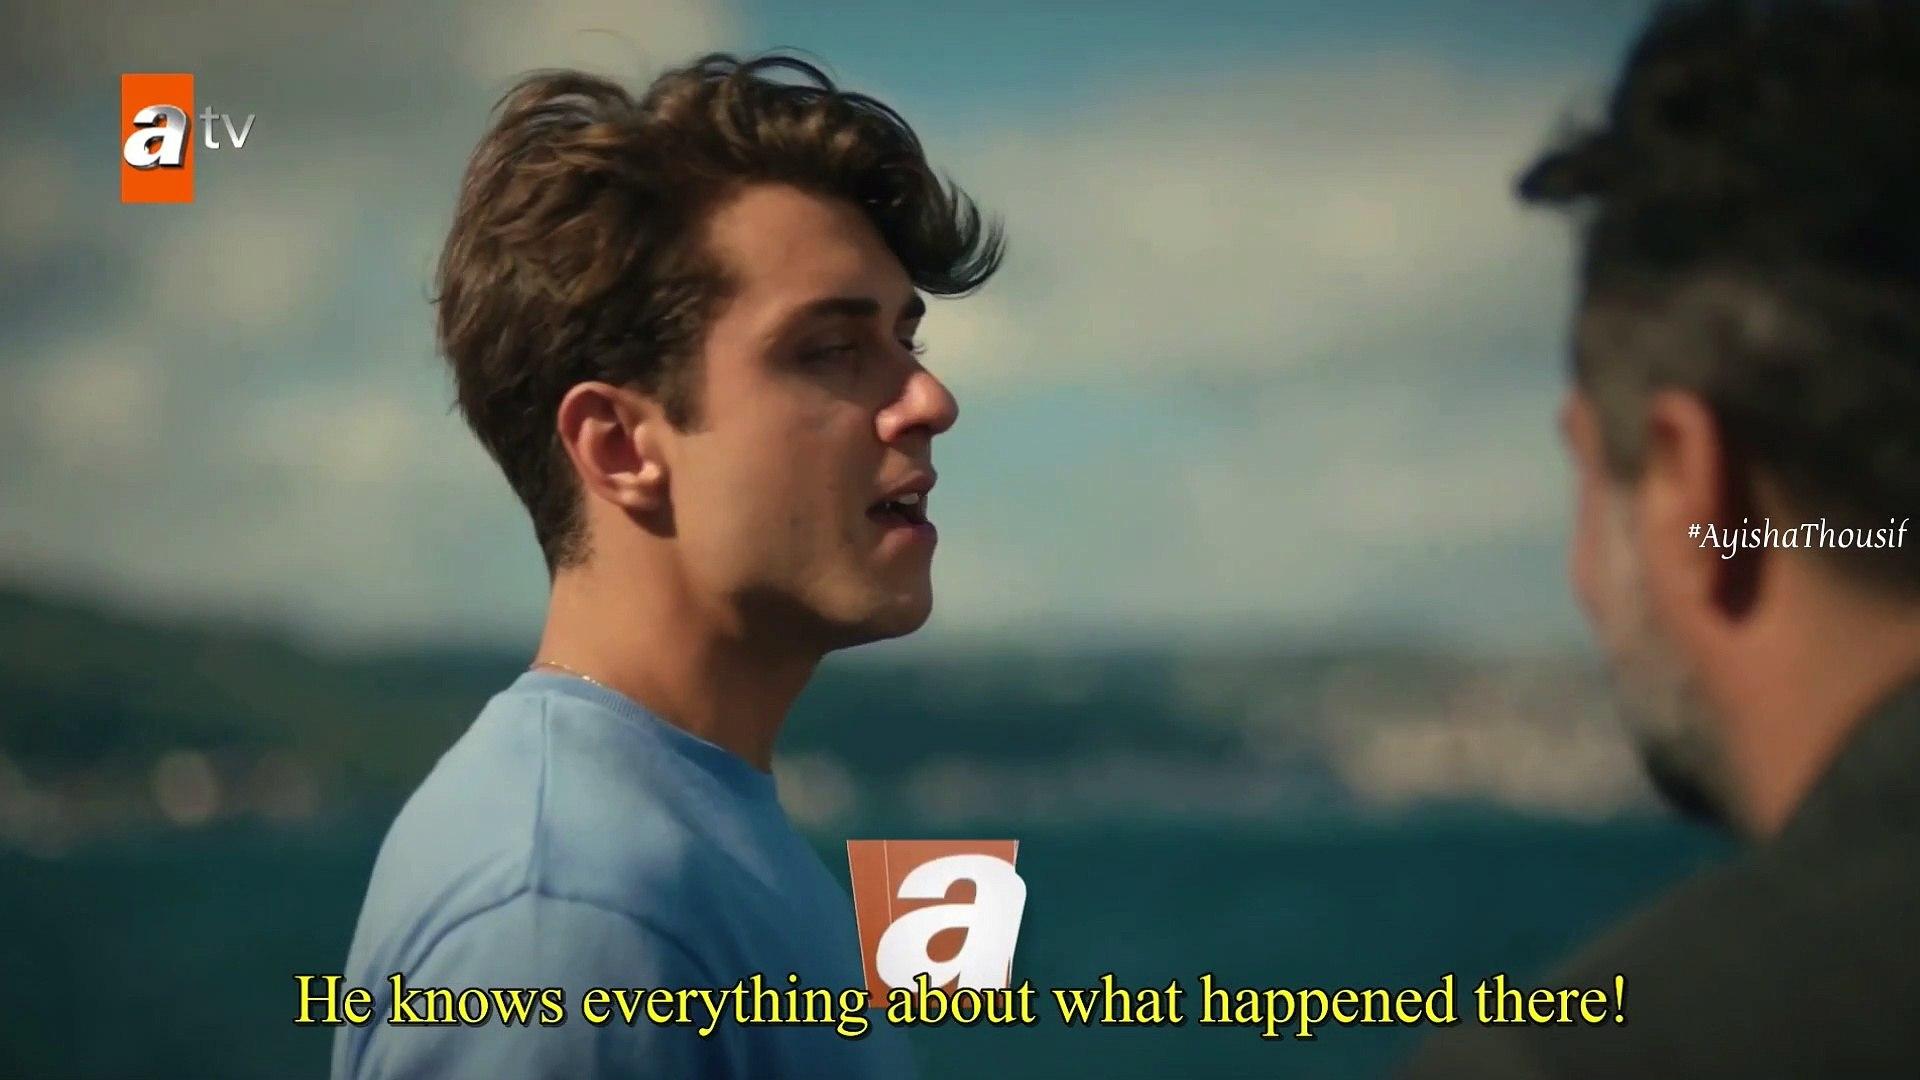 Kardeslerim episode 19 Trailer 1 with English subtitles